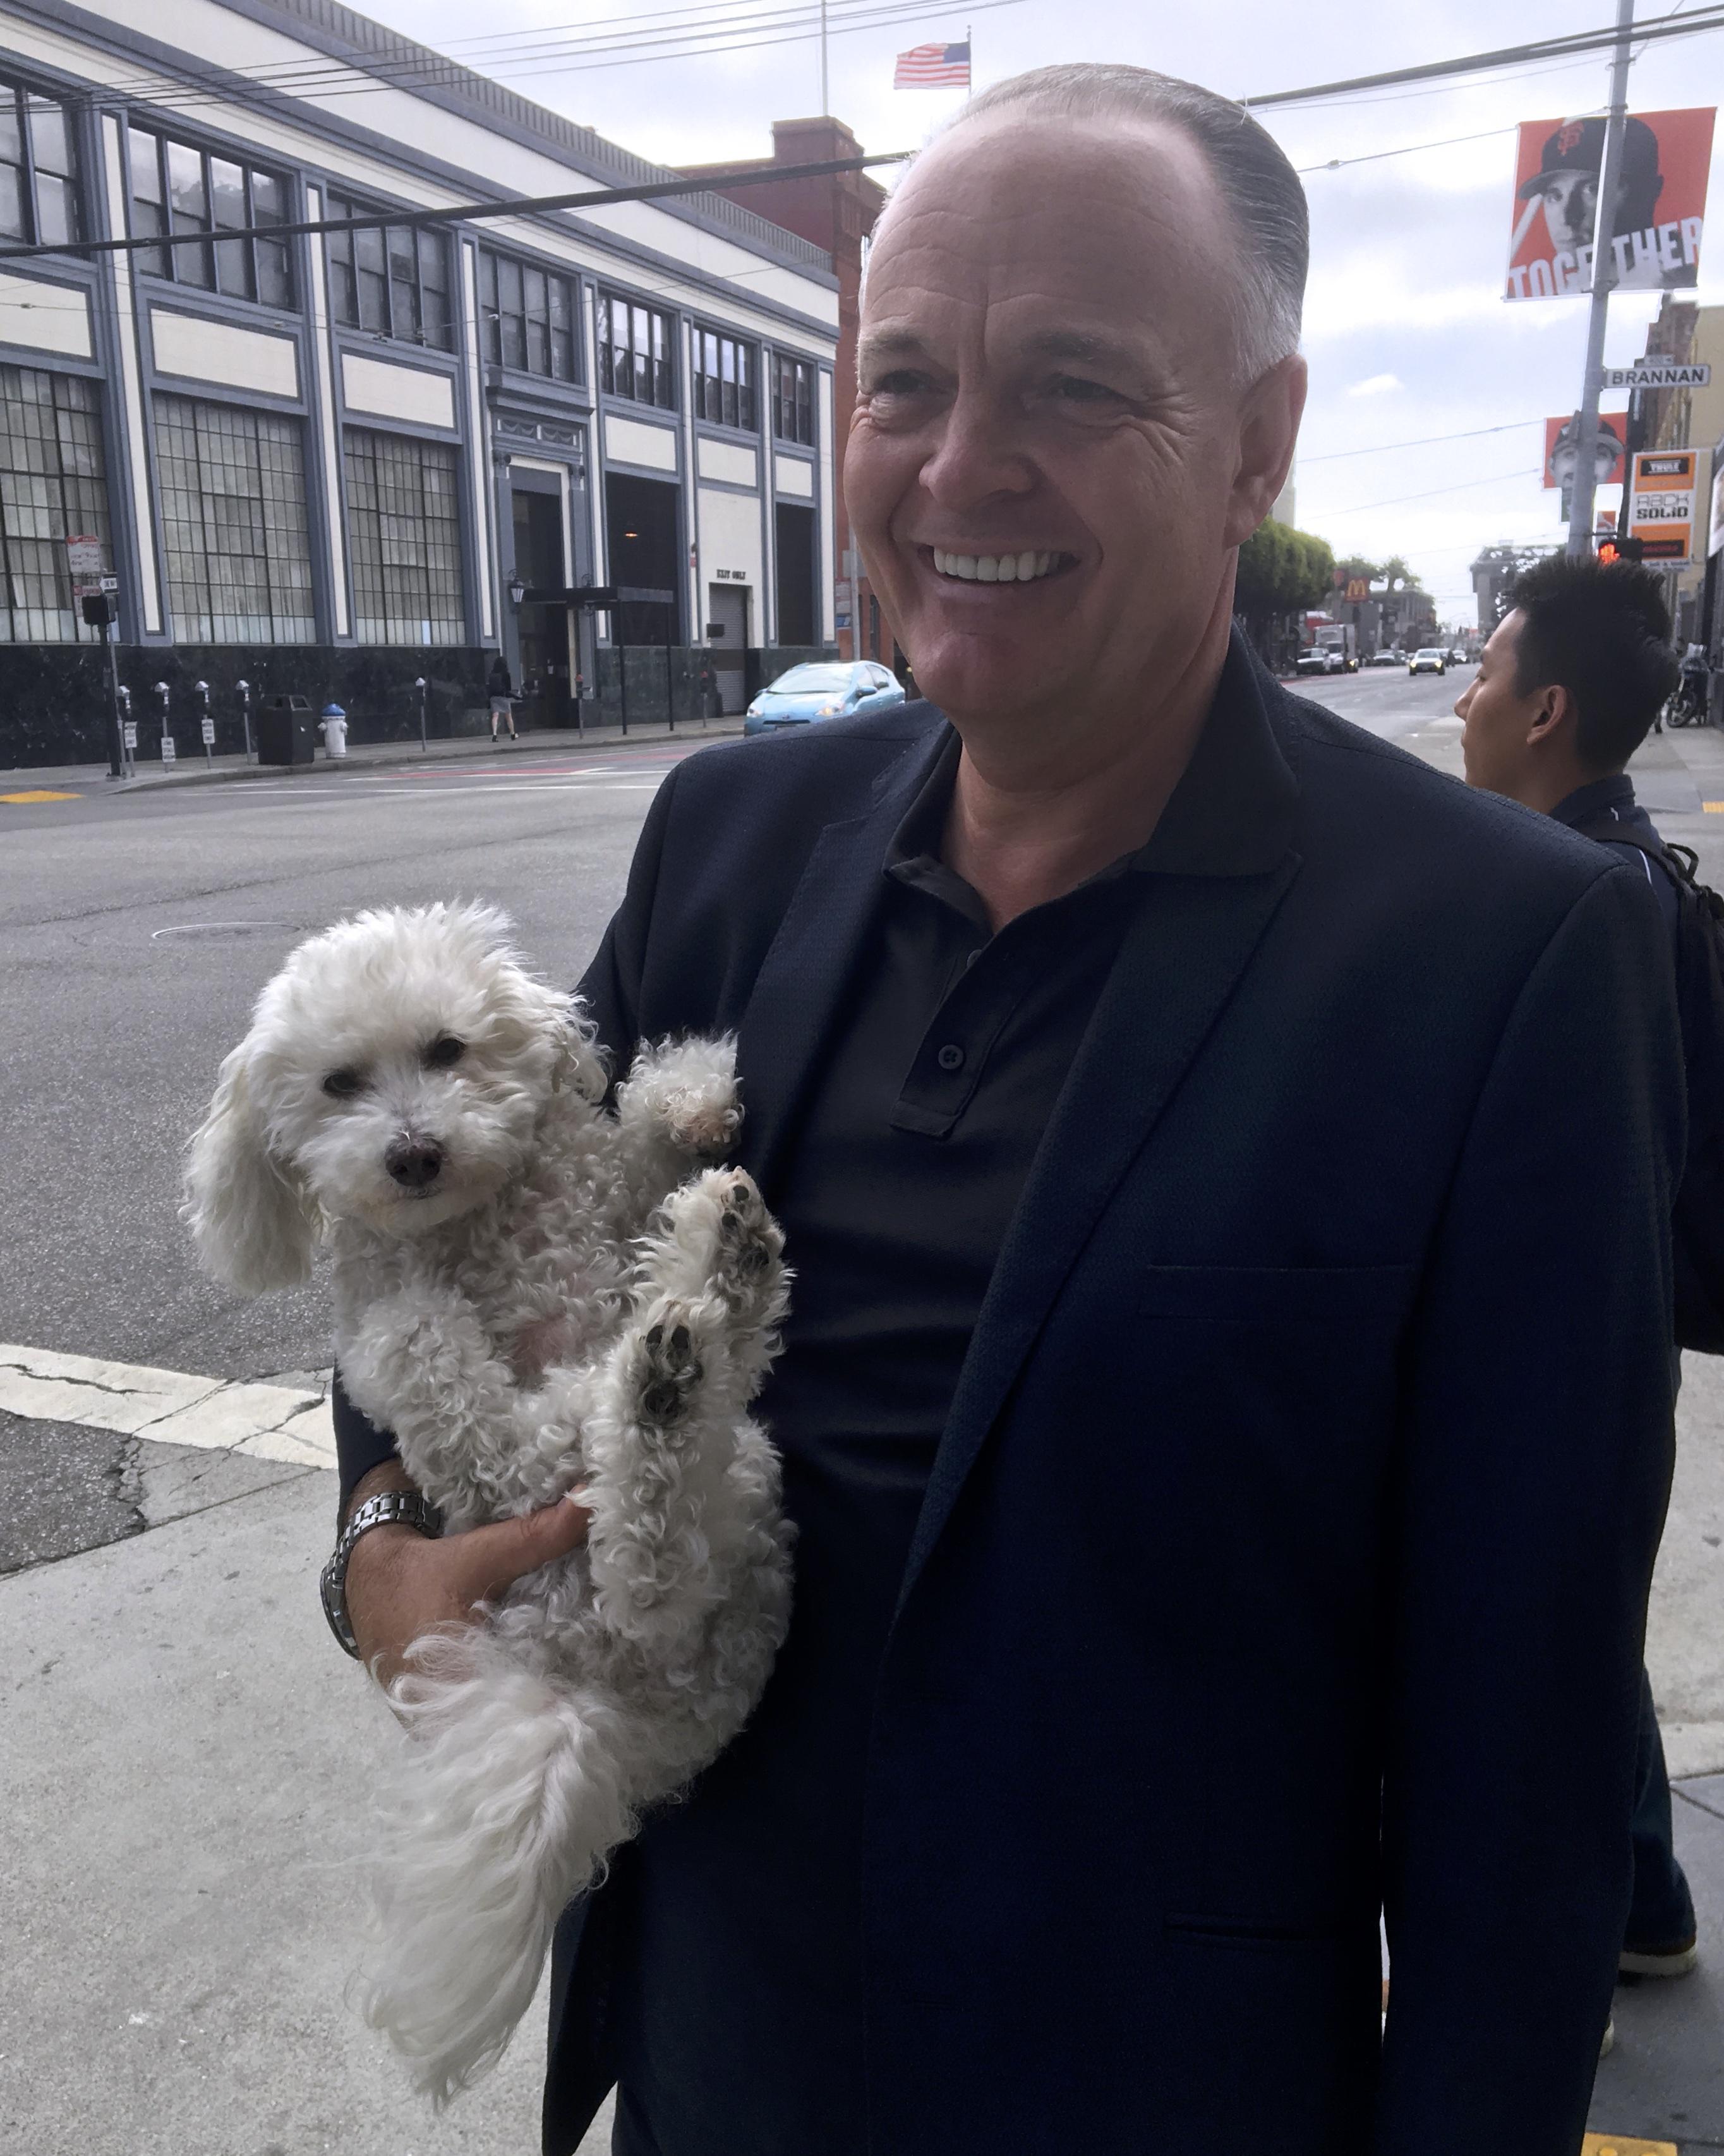 Man Holding Fluffy White Dog Upside Down Under One Arm